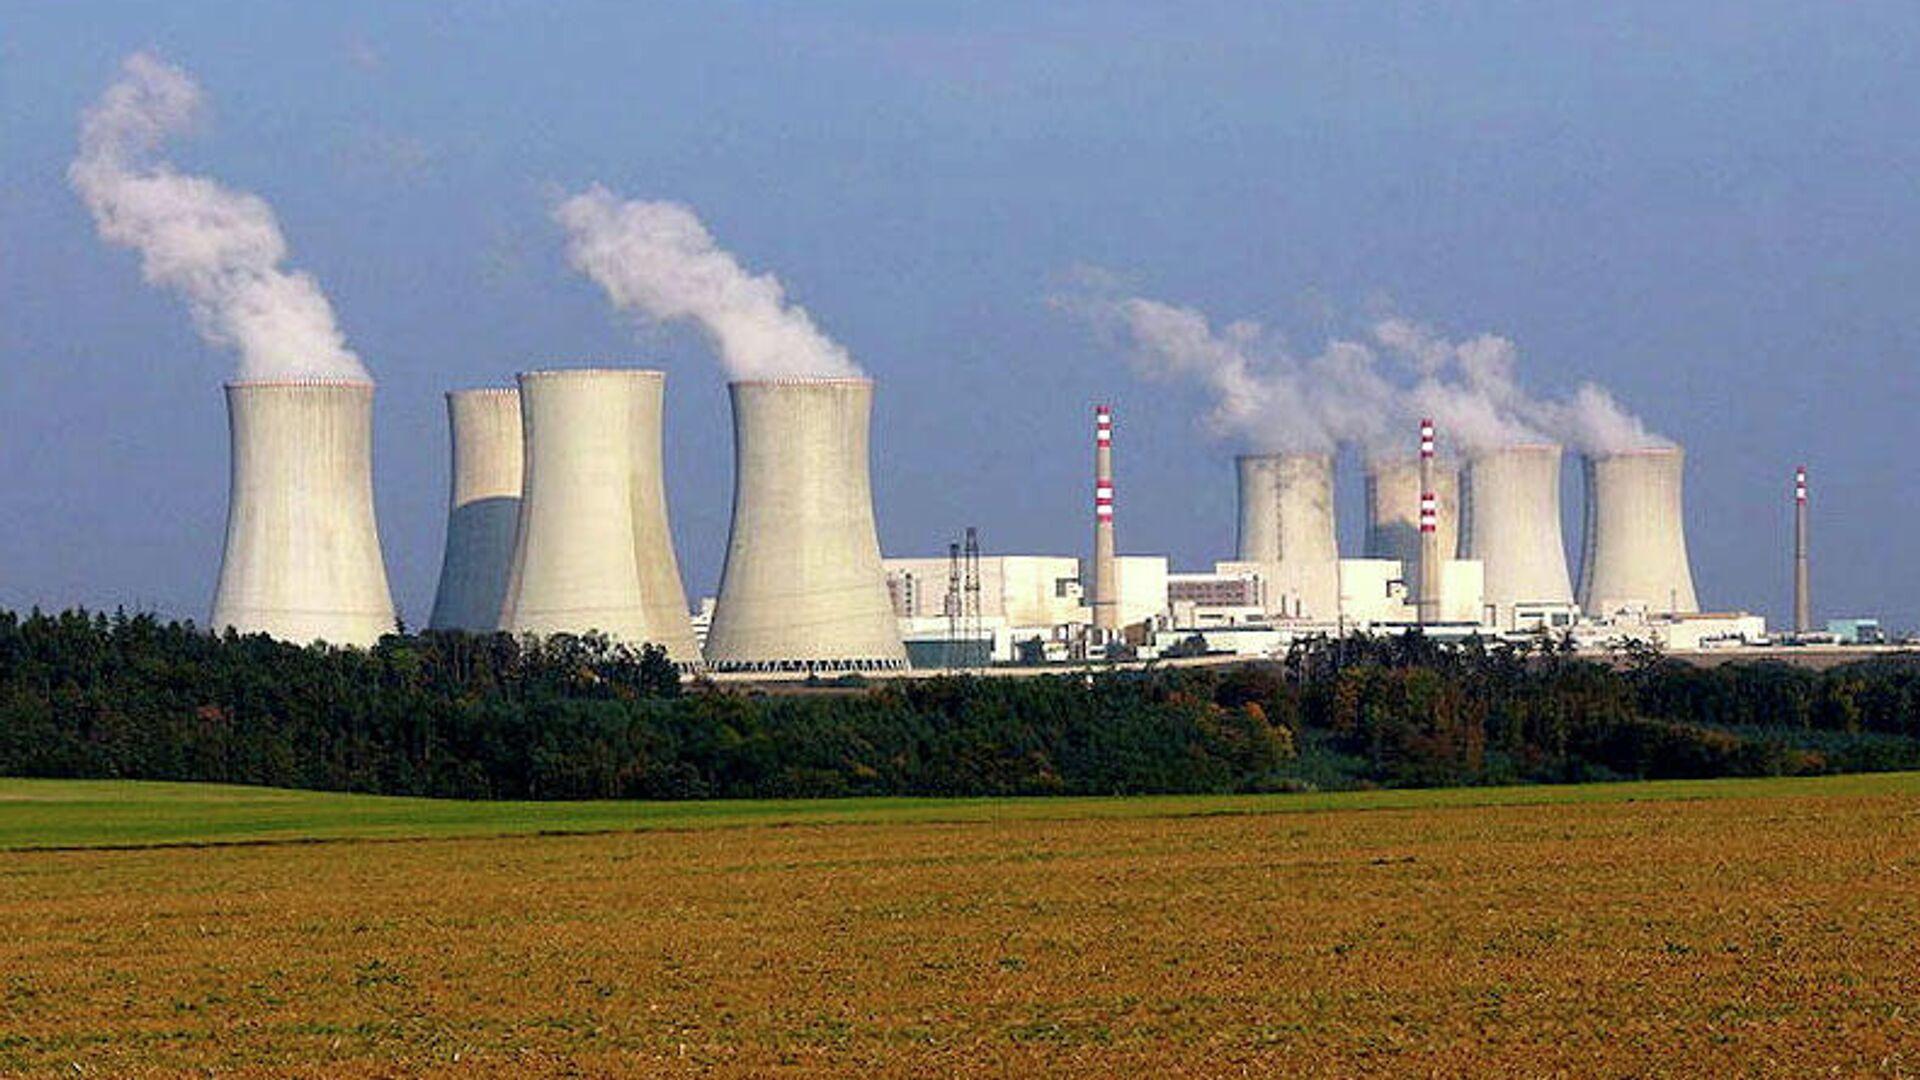 Nuclear.power.plant.Dukovany - Sputnik International, 1920, 28.09.2021